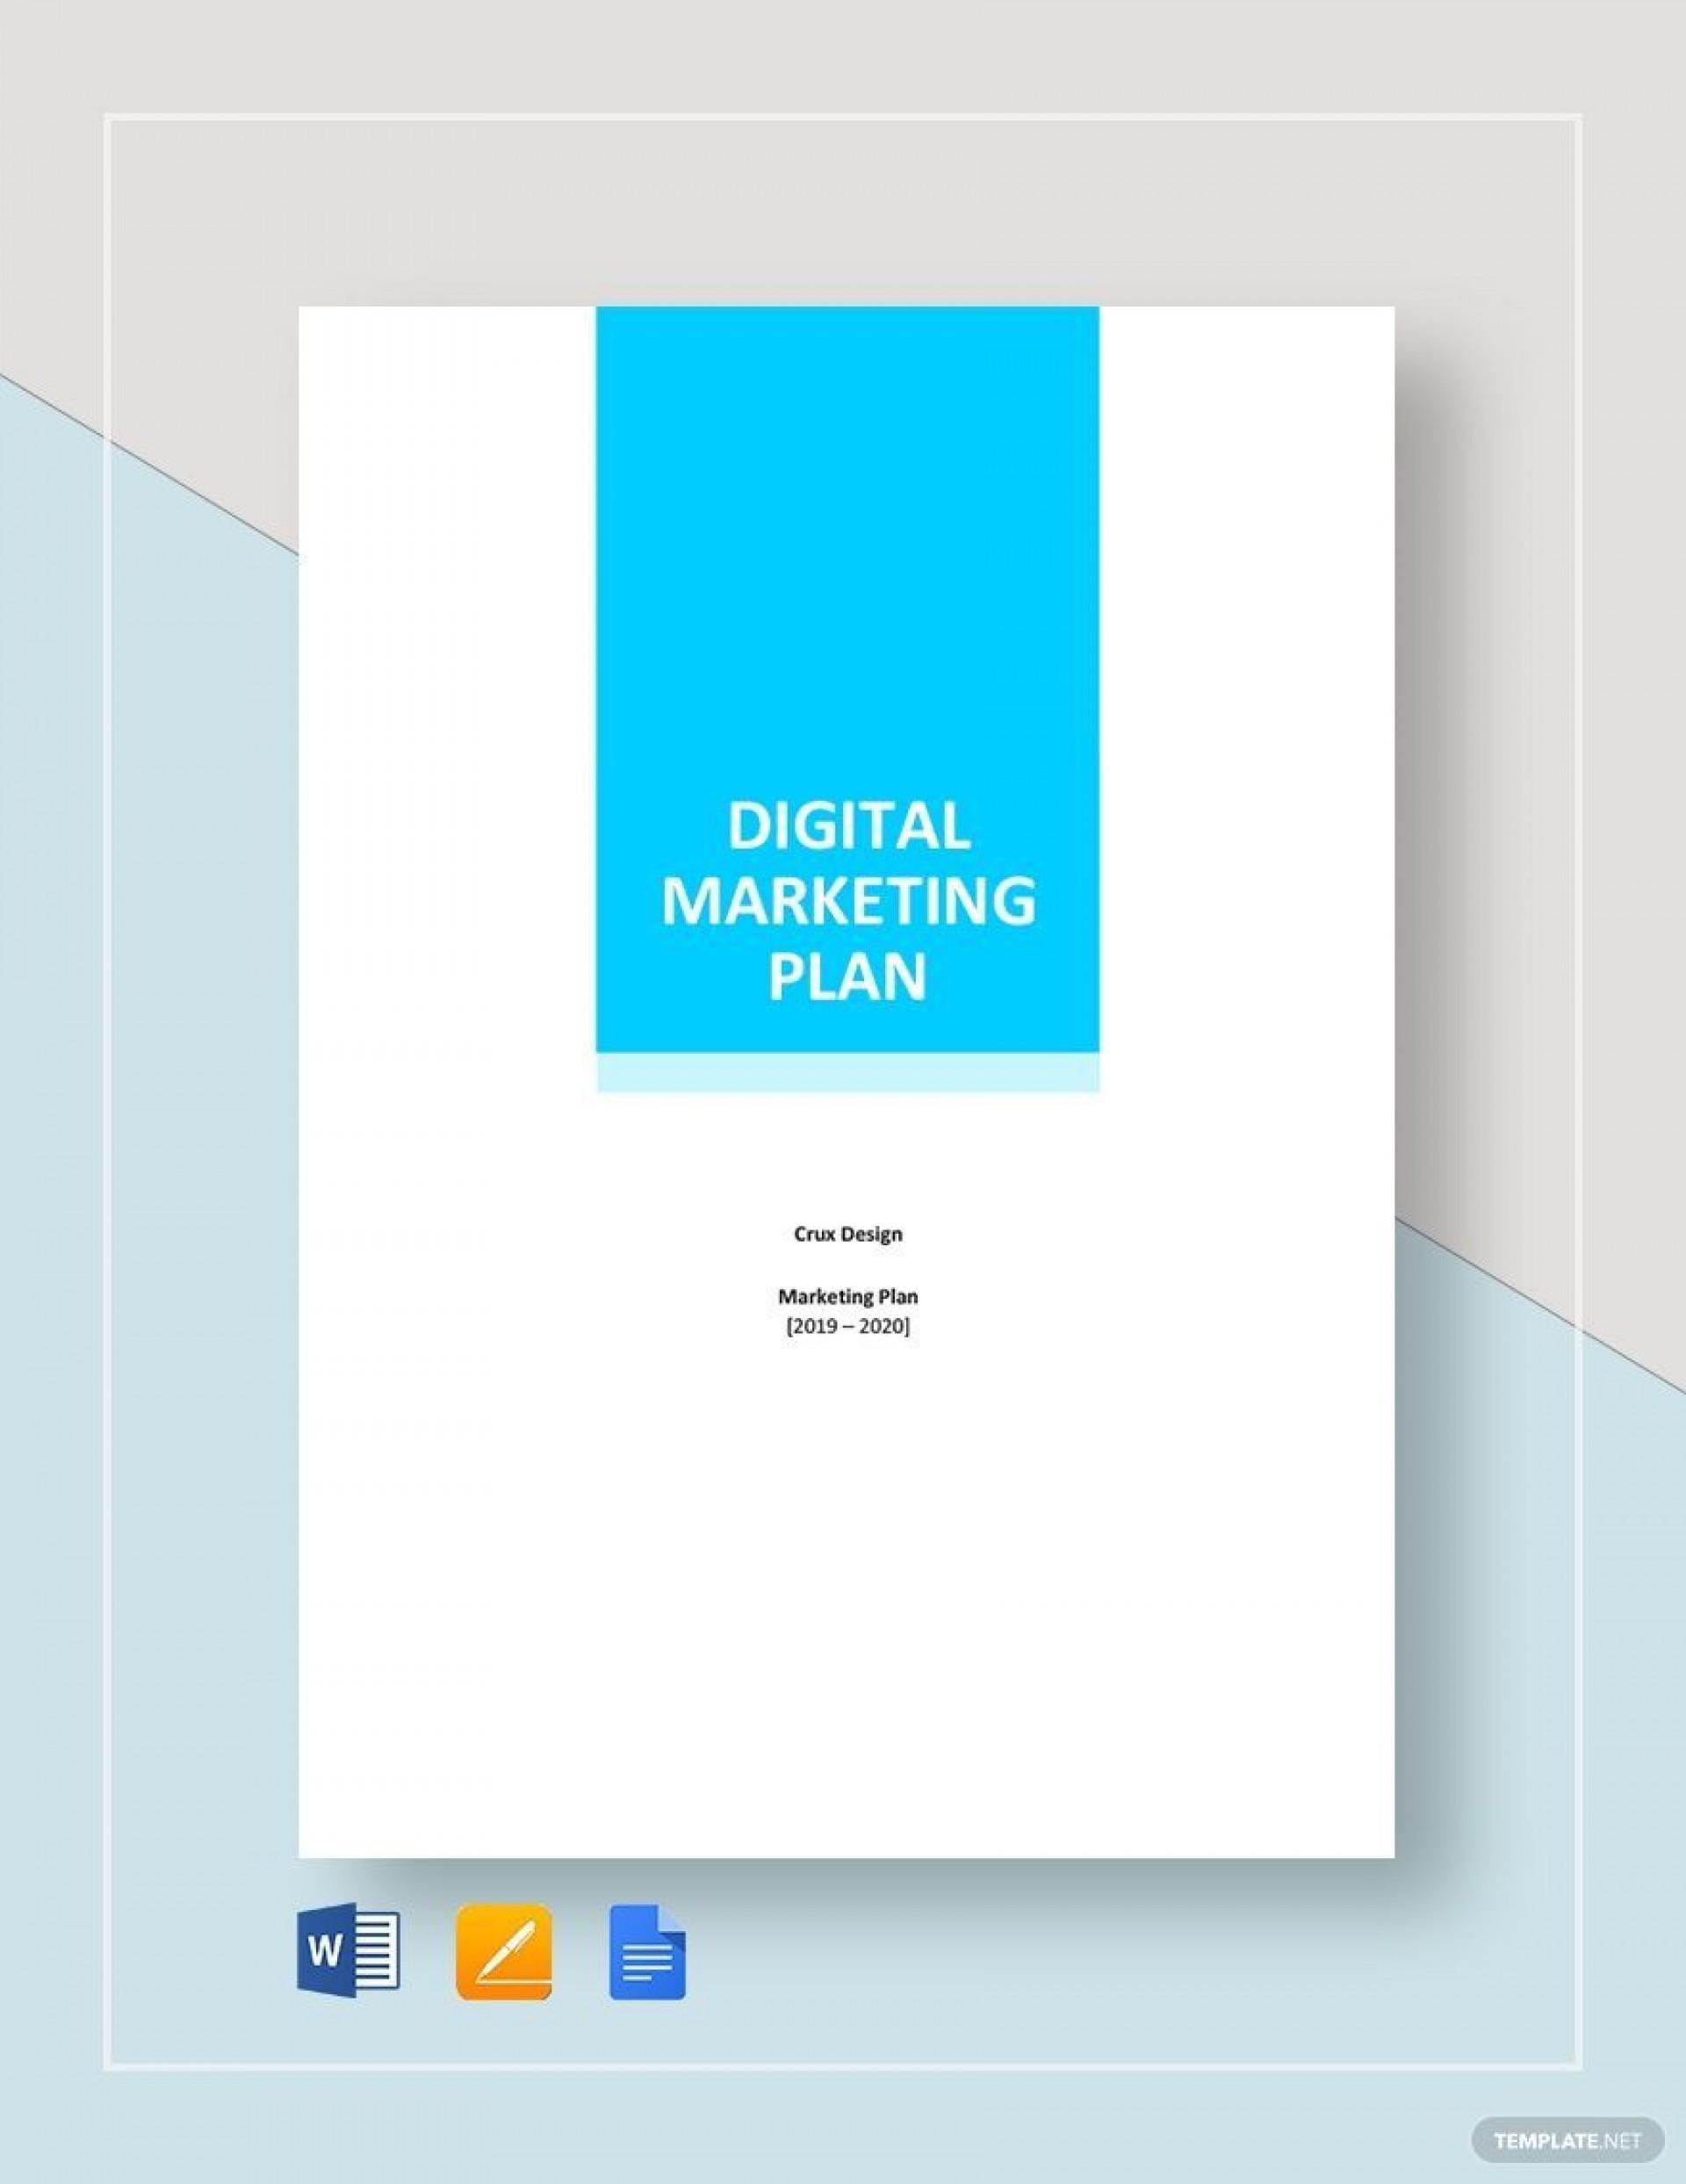 001 Archaicawful Digital Marketing Plan Template Word High Definition 1920